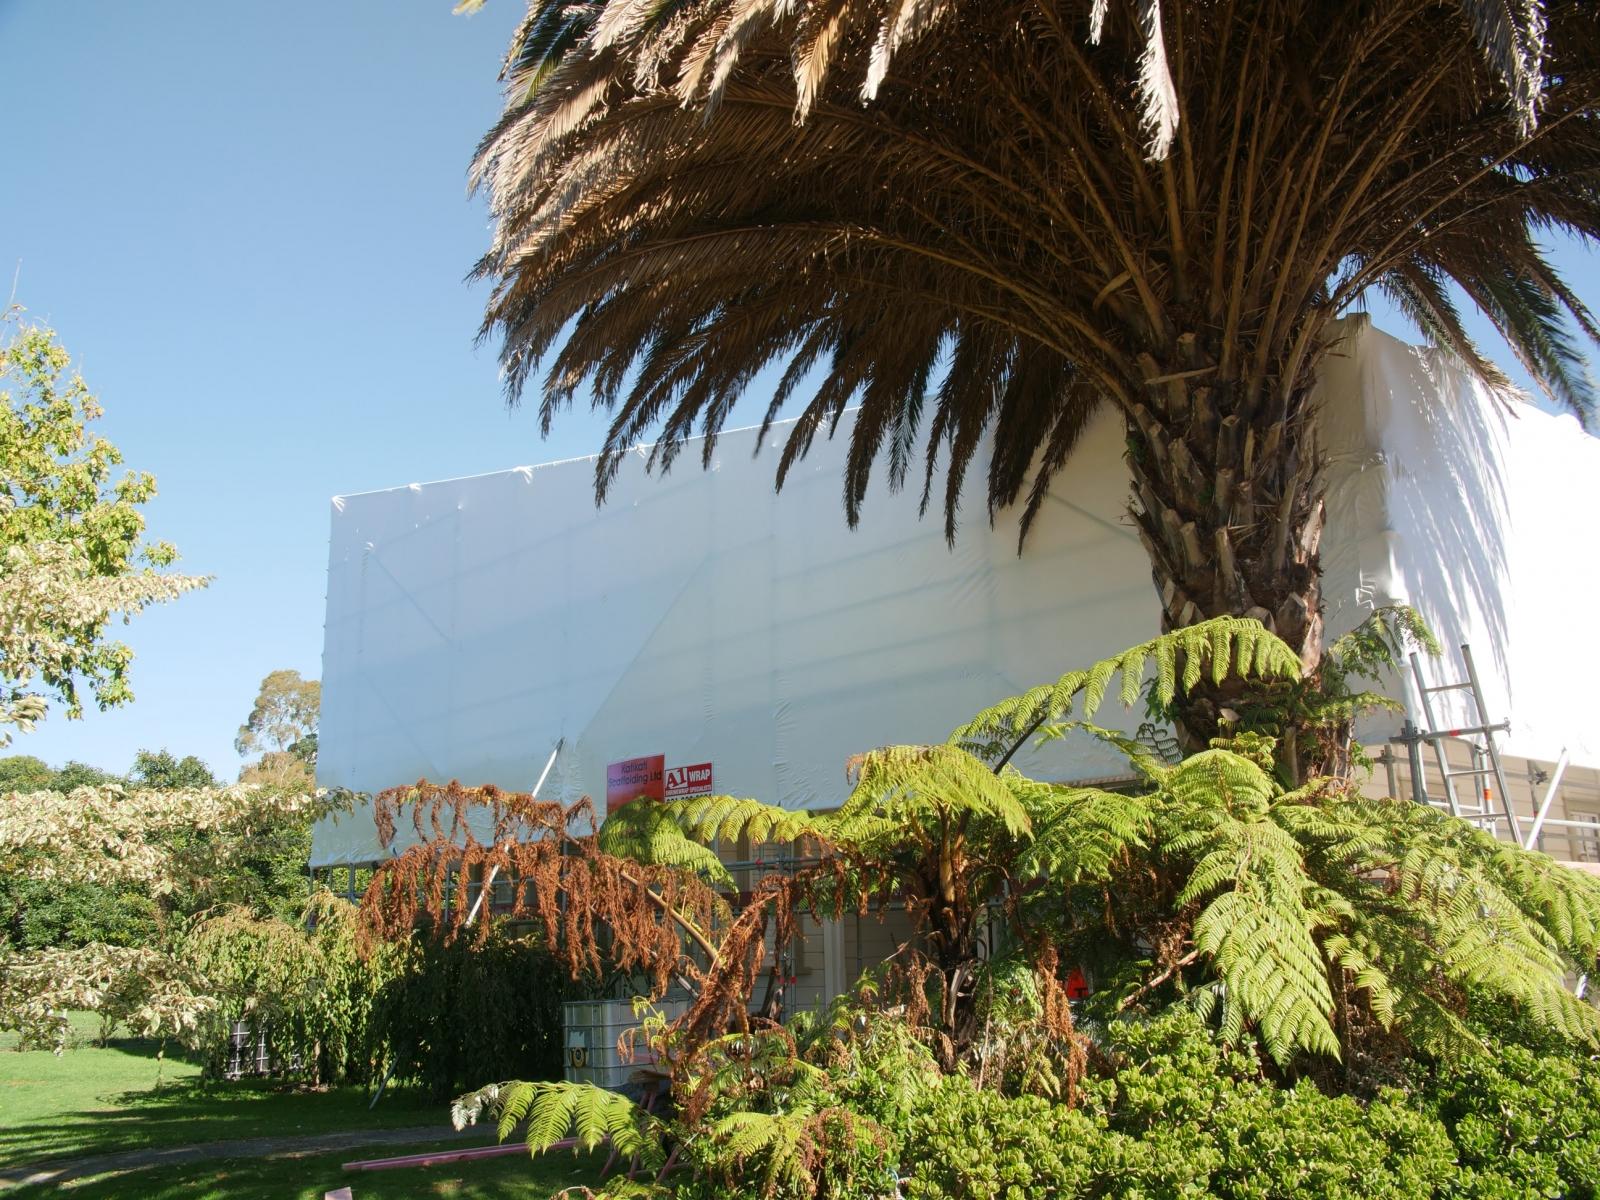 A1-Wrap-Residential-Gallery-Image-12-Waiau-residential-2-BOP-min